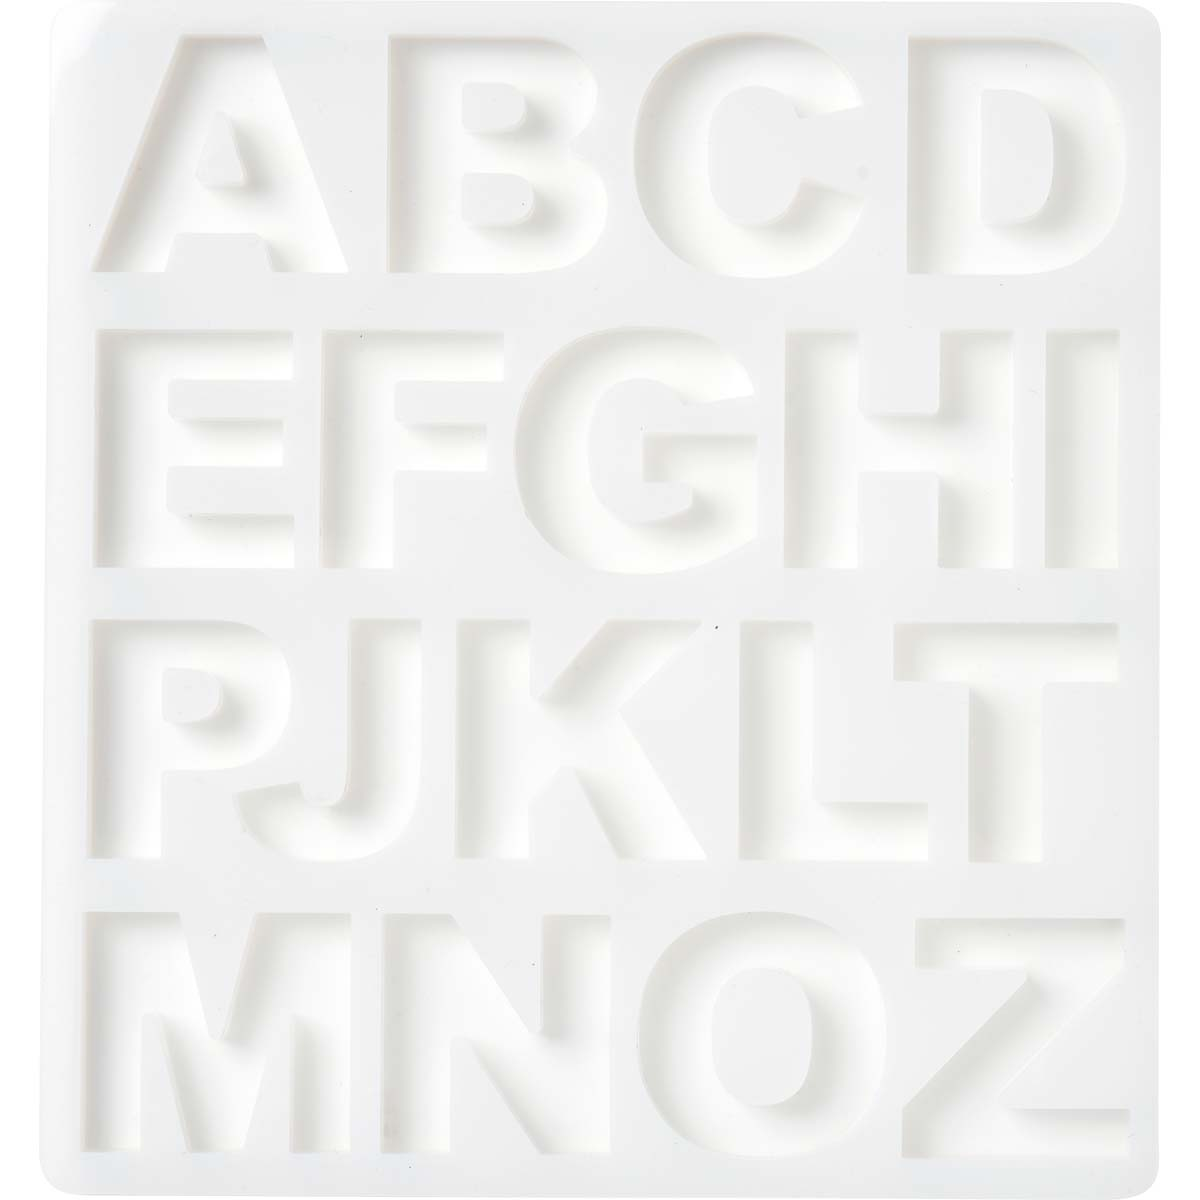 Mod Podge ® Silicone Molds - Alphabet, 2 pc. - 25293